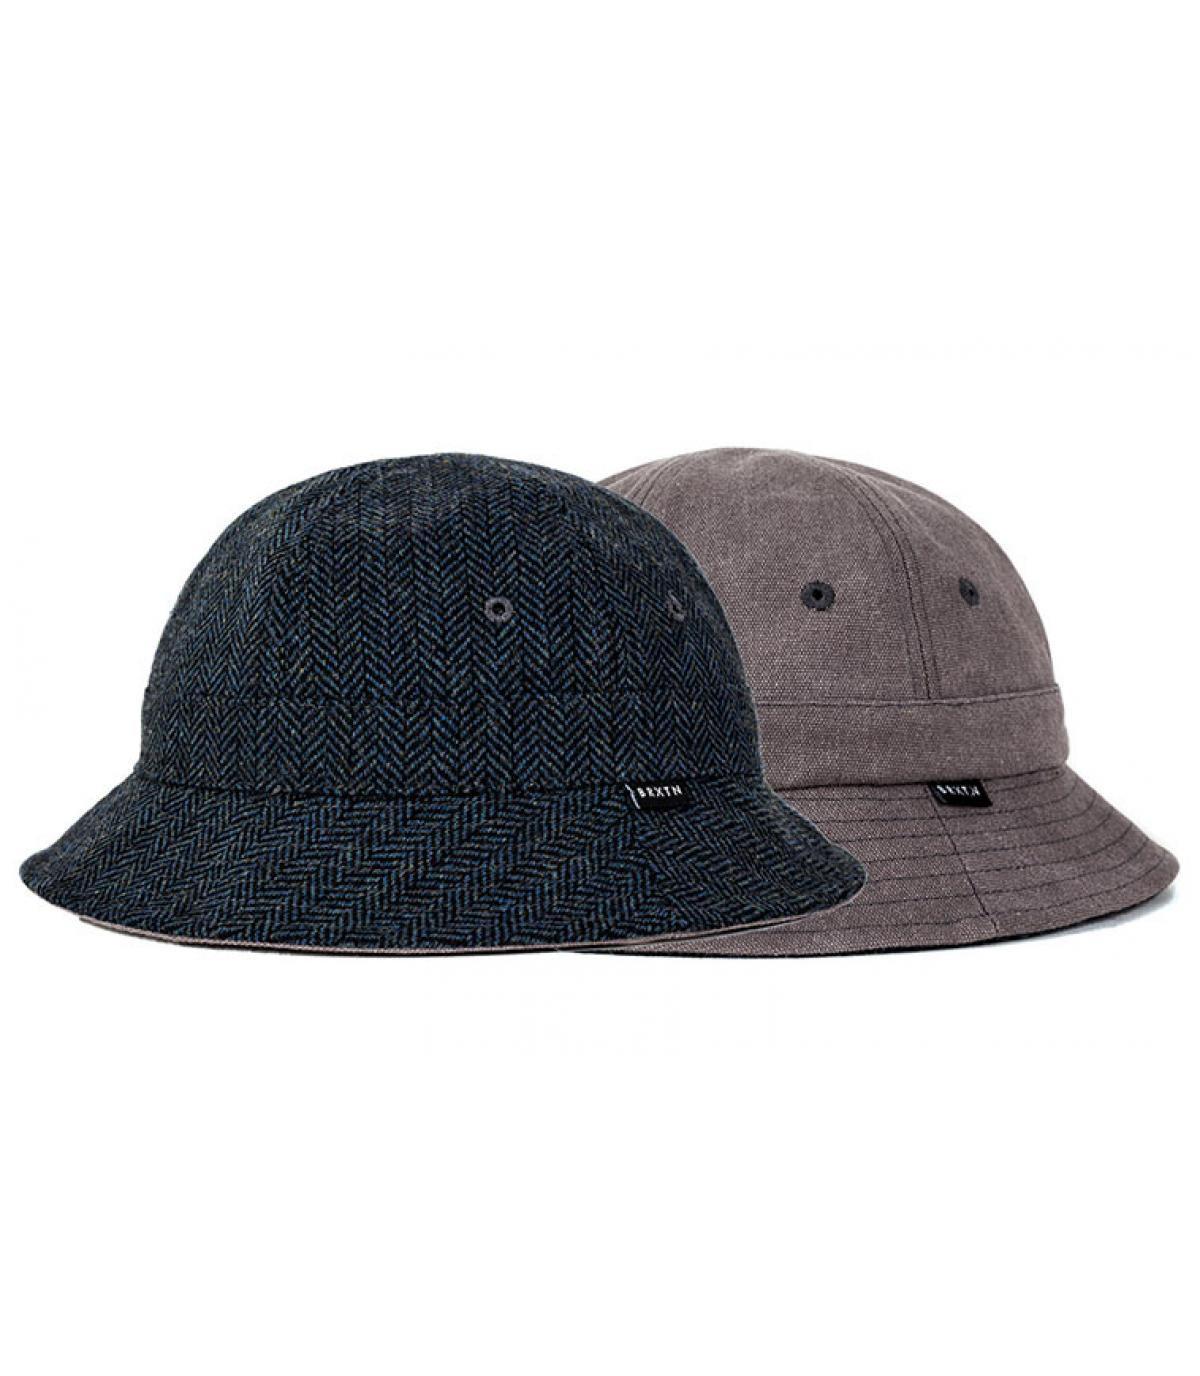 Détails Banks bucket hat navy grey - image 2